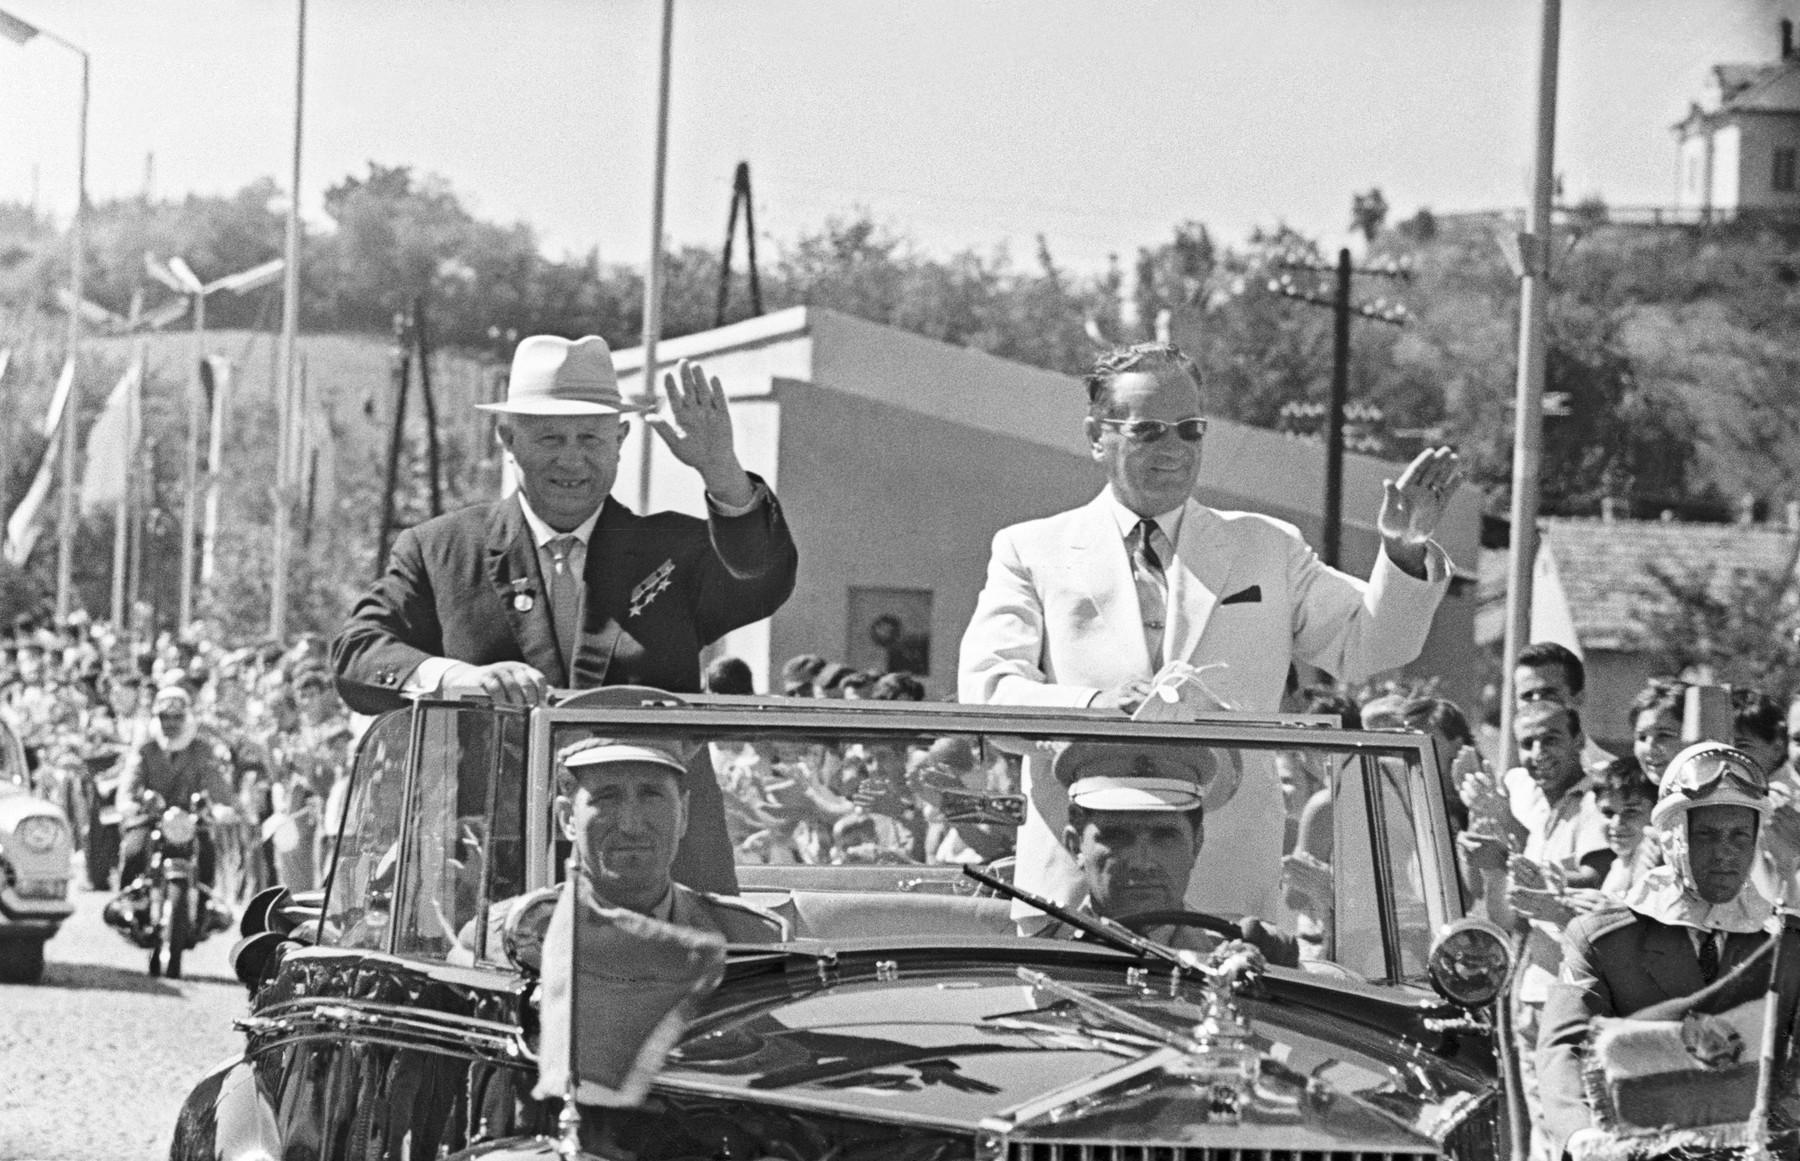 Yugoslavia. First Secretary of the Central Committee of the Soviet Communist Party Nikita Khrushchev (R) and Chairman of the League of Communists of Yugoslavia Josip Broz Tito. Photo TASS / Vasily Yegorov ?aоnлaвey.  Ia?вuй nae?aoa?ь ЦE EINN Нeeeoa O?уuaв (nлaвa) e   i?aдnaдaoaль Nо?зa eоiiунenoов ?aоnлaвee  Eоnei Б?оз Oeoо. во в?aiy вeзeoa. Фоoо Вaneлey Aaо?овa (Фоoоo?онeea OANN) *** Local Caption *** A000F13E, Image: 86712488, License: Rights-managed, Restrictions: , Model Release: no, Credit line: ITAR TASS / TASS / Profimedia